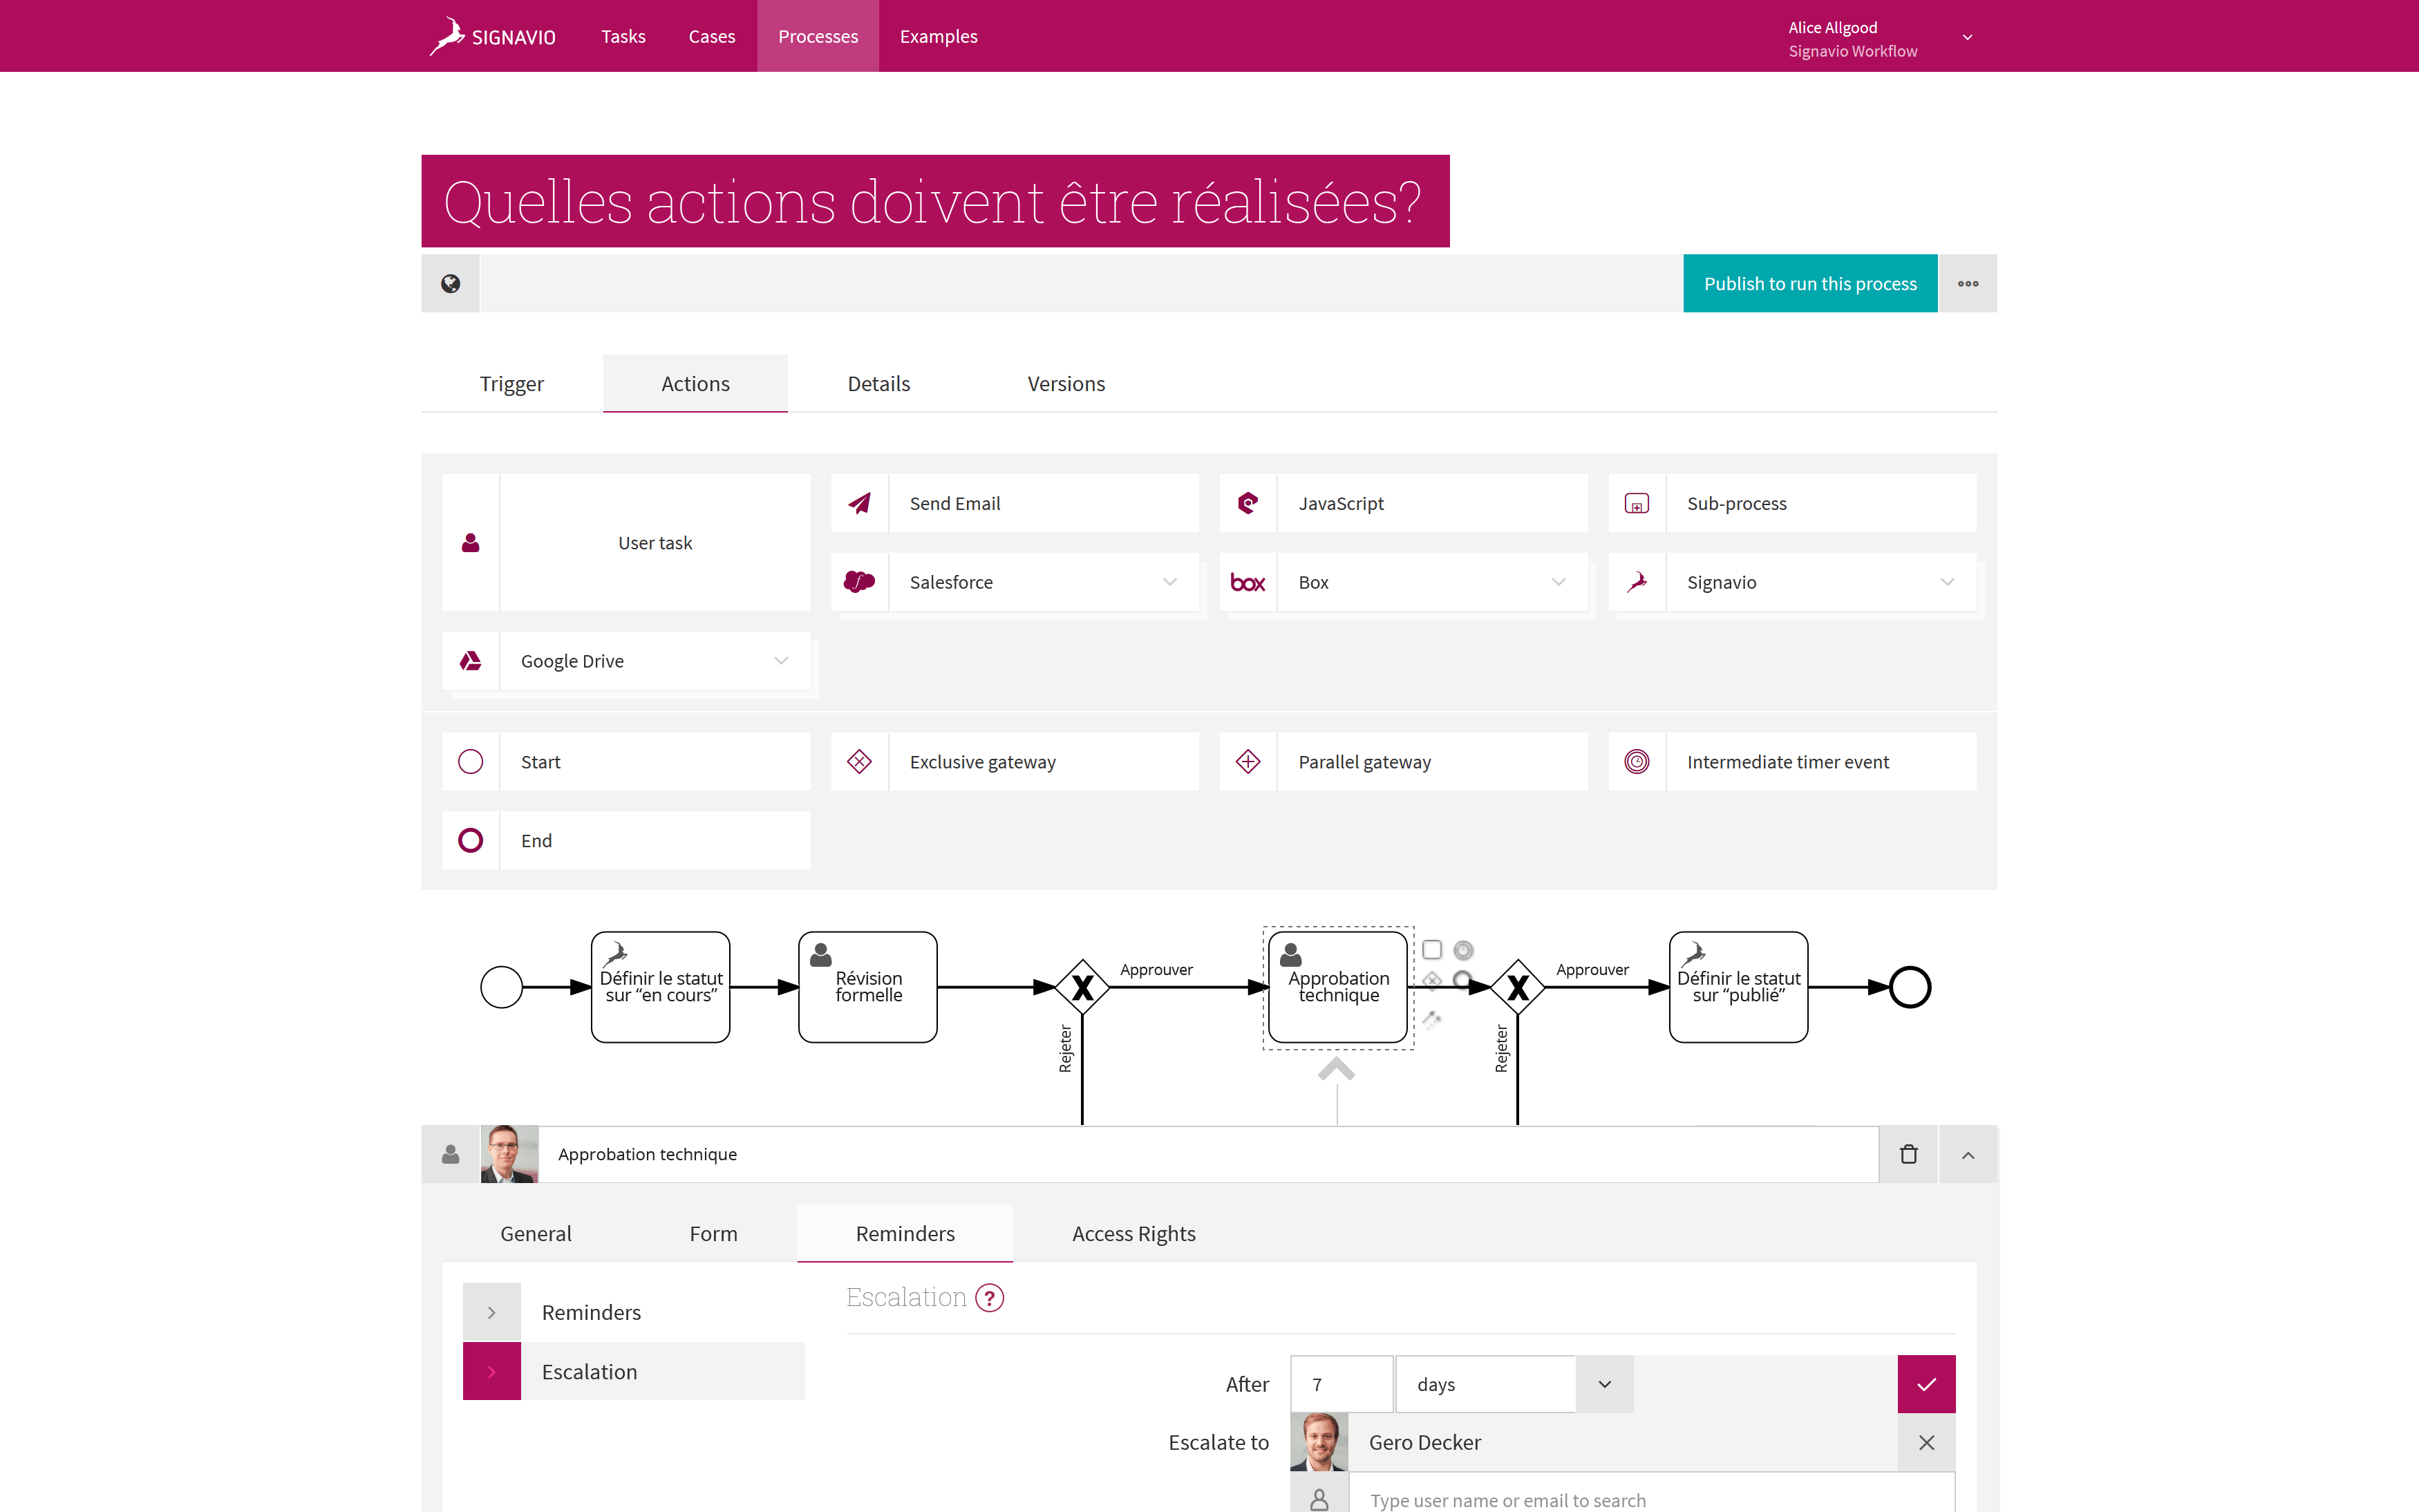 Approval Workflow - Signavio Process Editor Screenshot